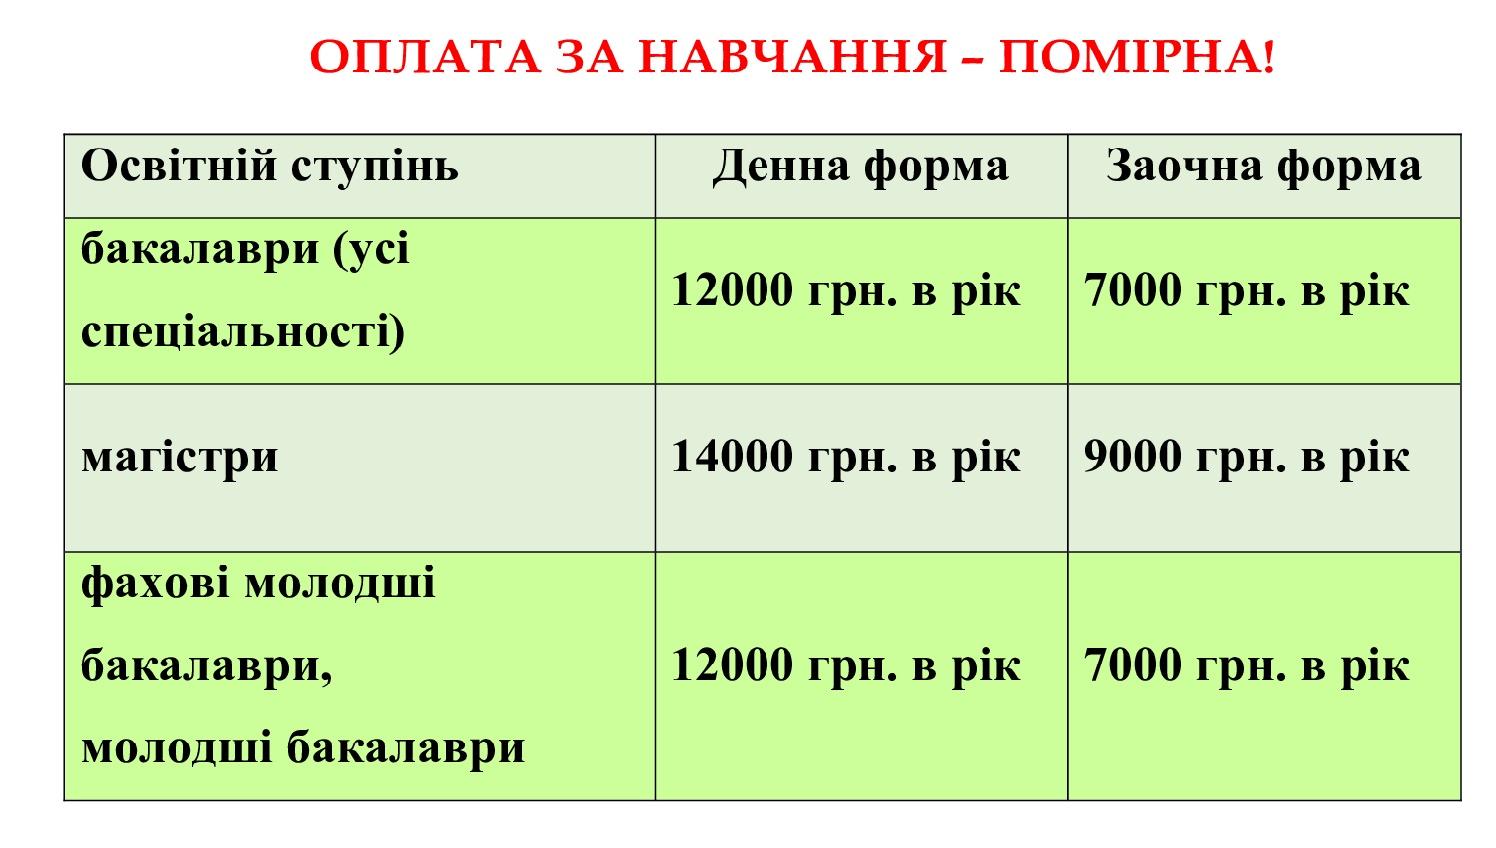 oplata-za-navchannya.jpg (226.47 Kb)